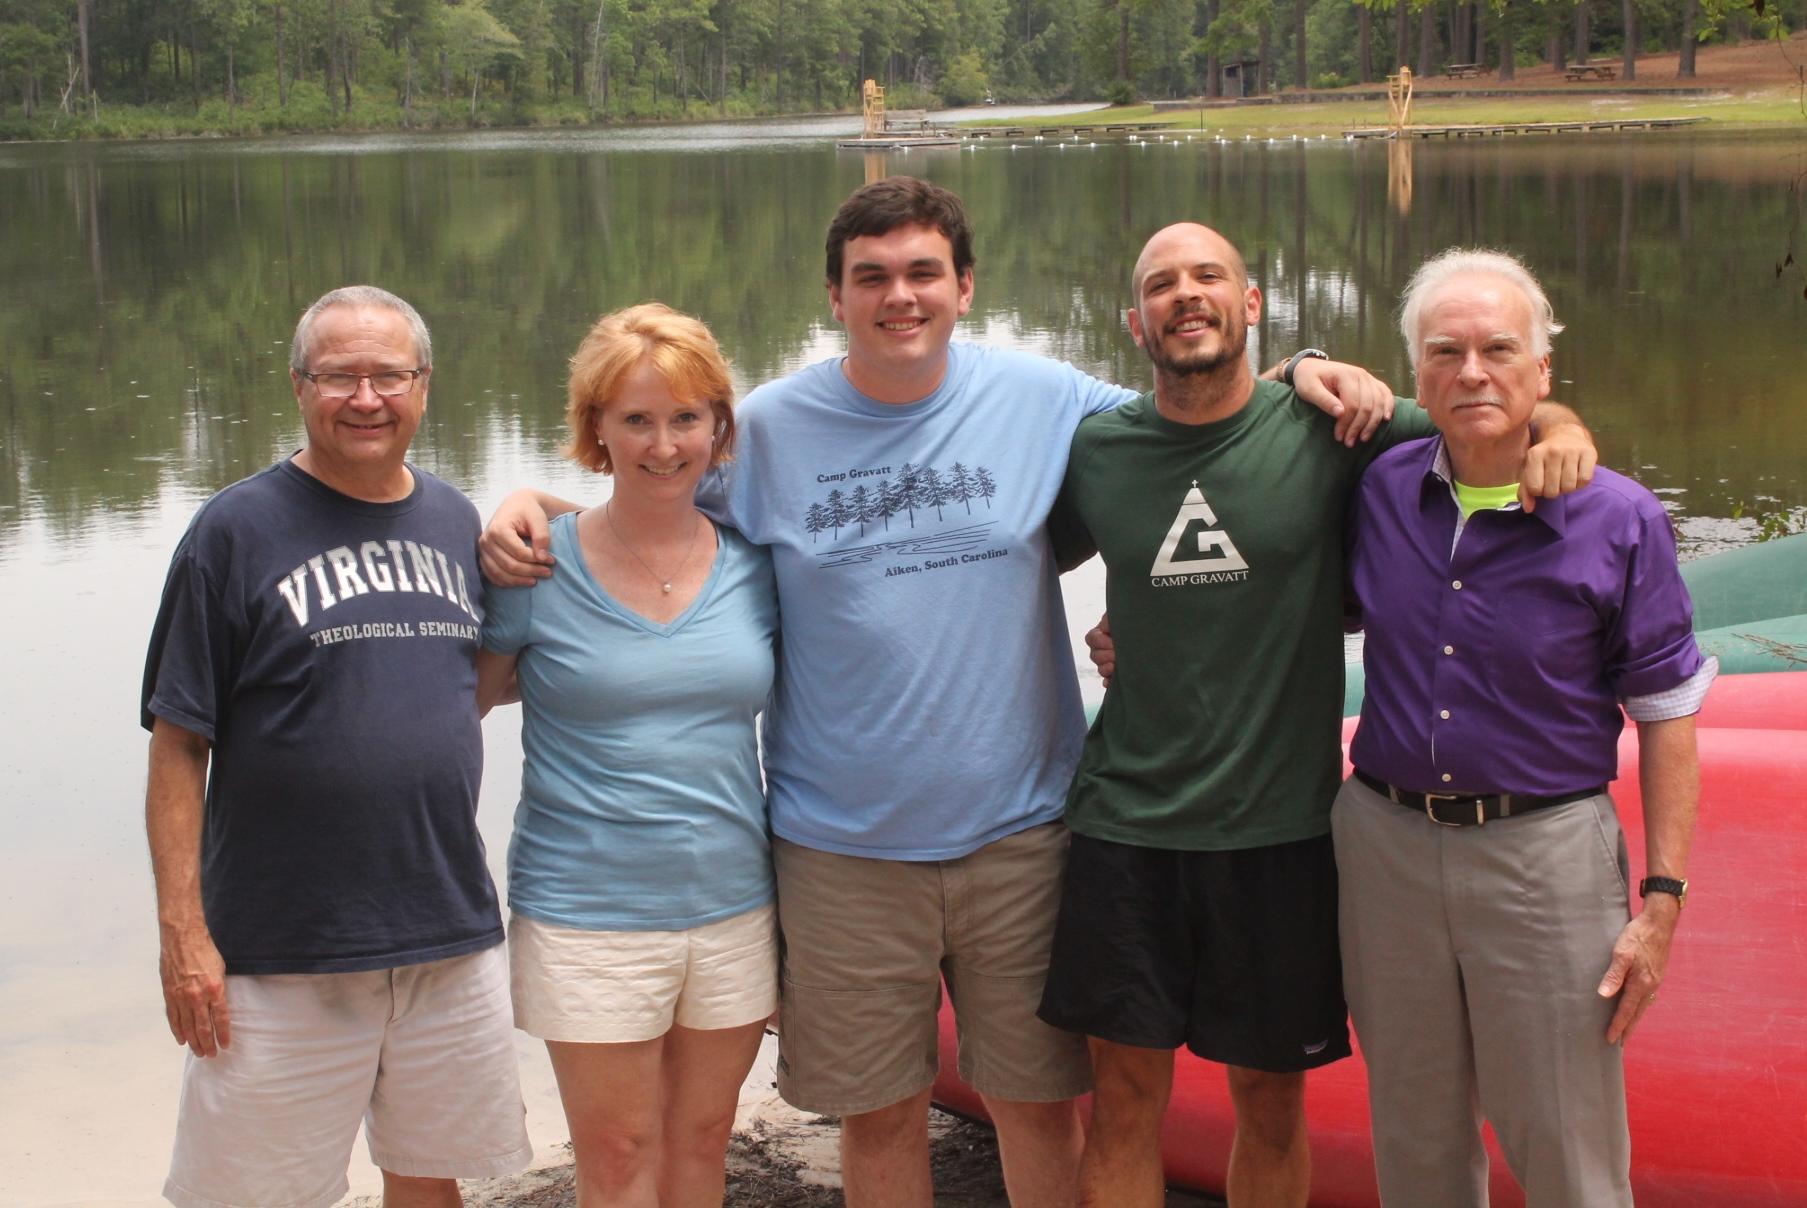 Camp Directors: Scotty Brock (1985 ), Lauri SoJourner (2007-  09), Frank Townsend (2017...), Scott McNeely (2012-  16), Fred Byrd (1976-83)